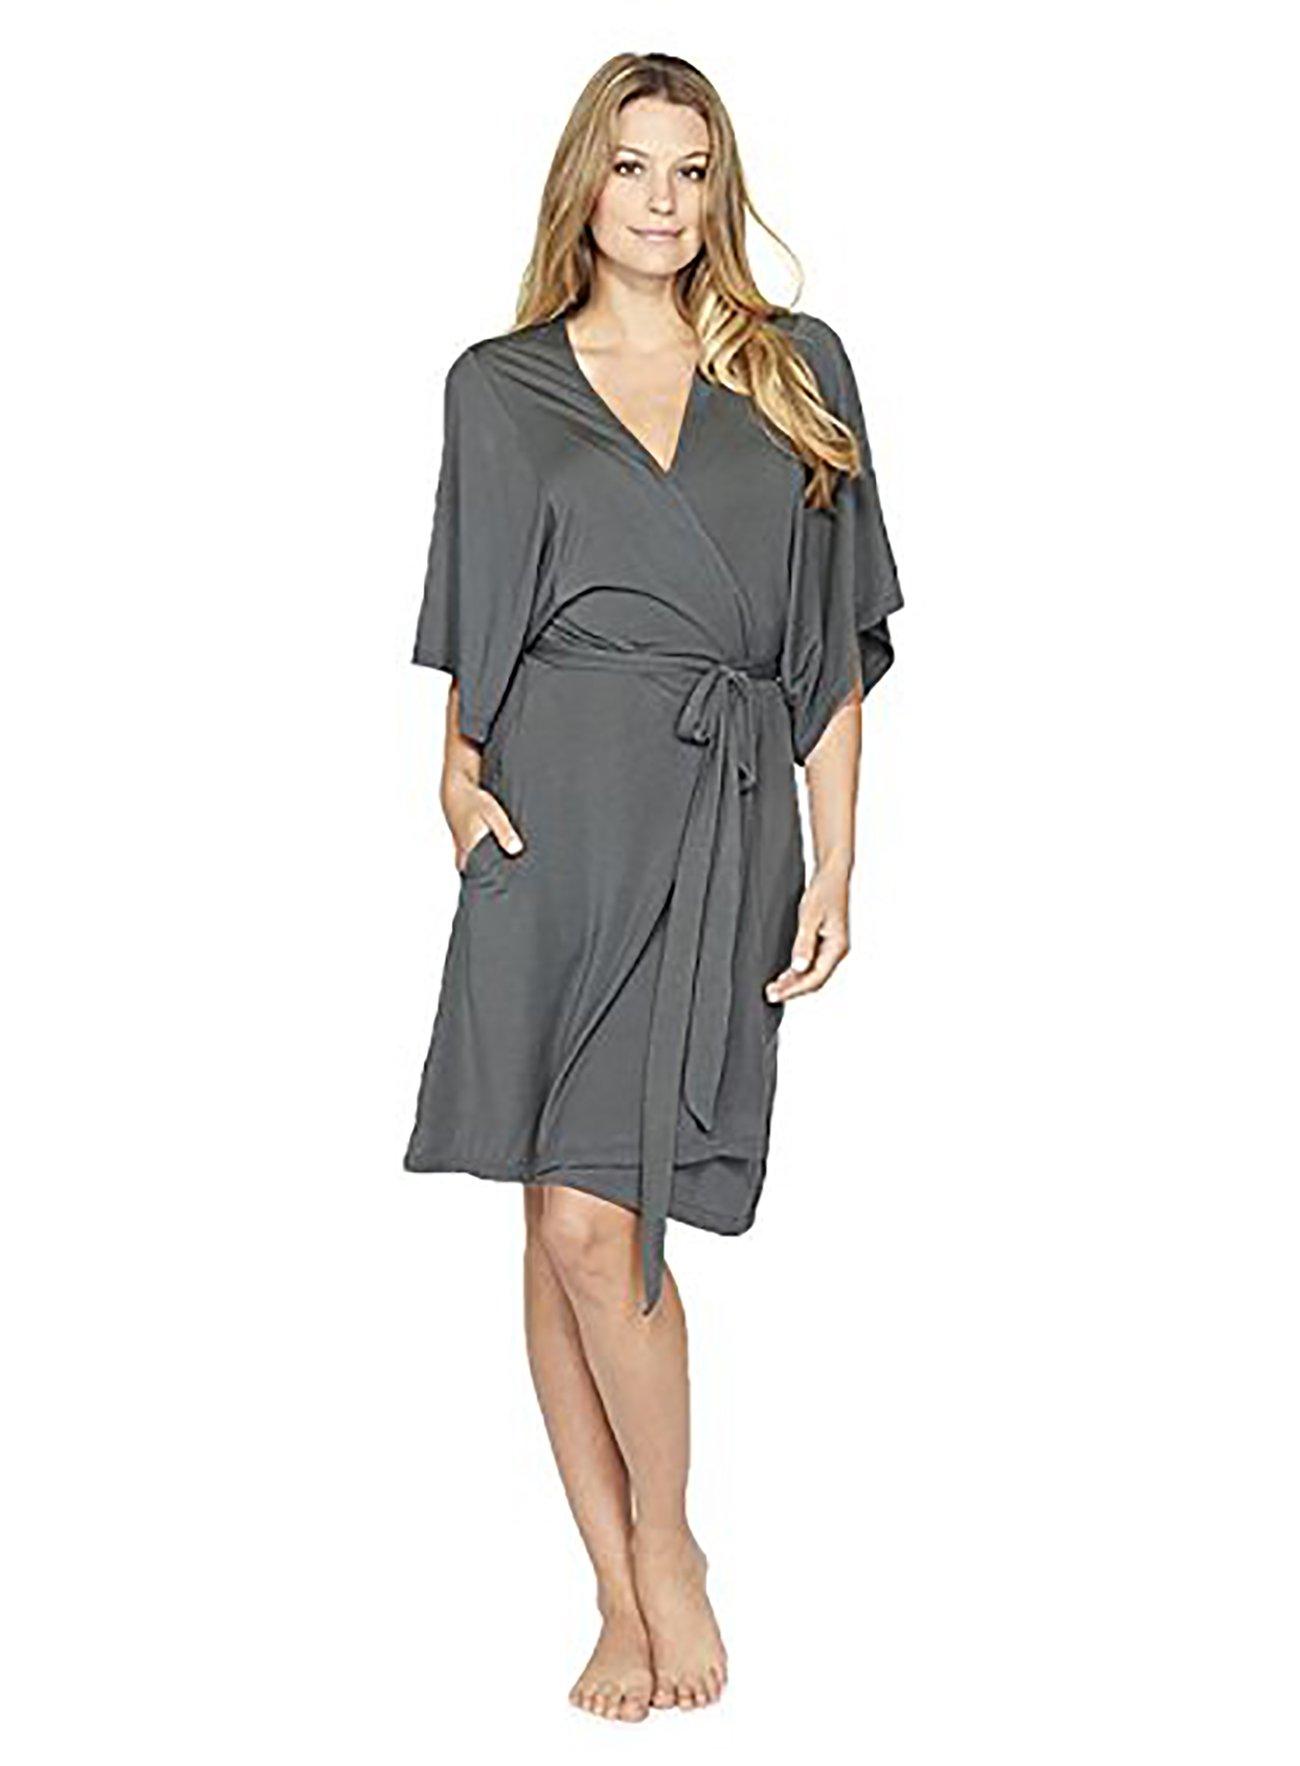 Barefoot Dreams Luxe Milk Jersey Short Robe - Graphite, Medium